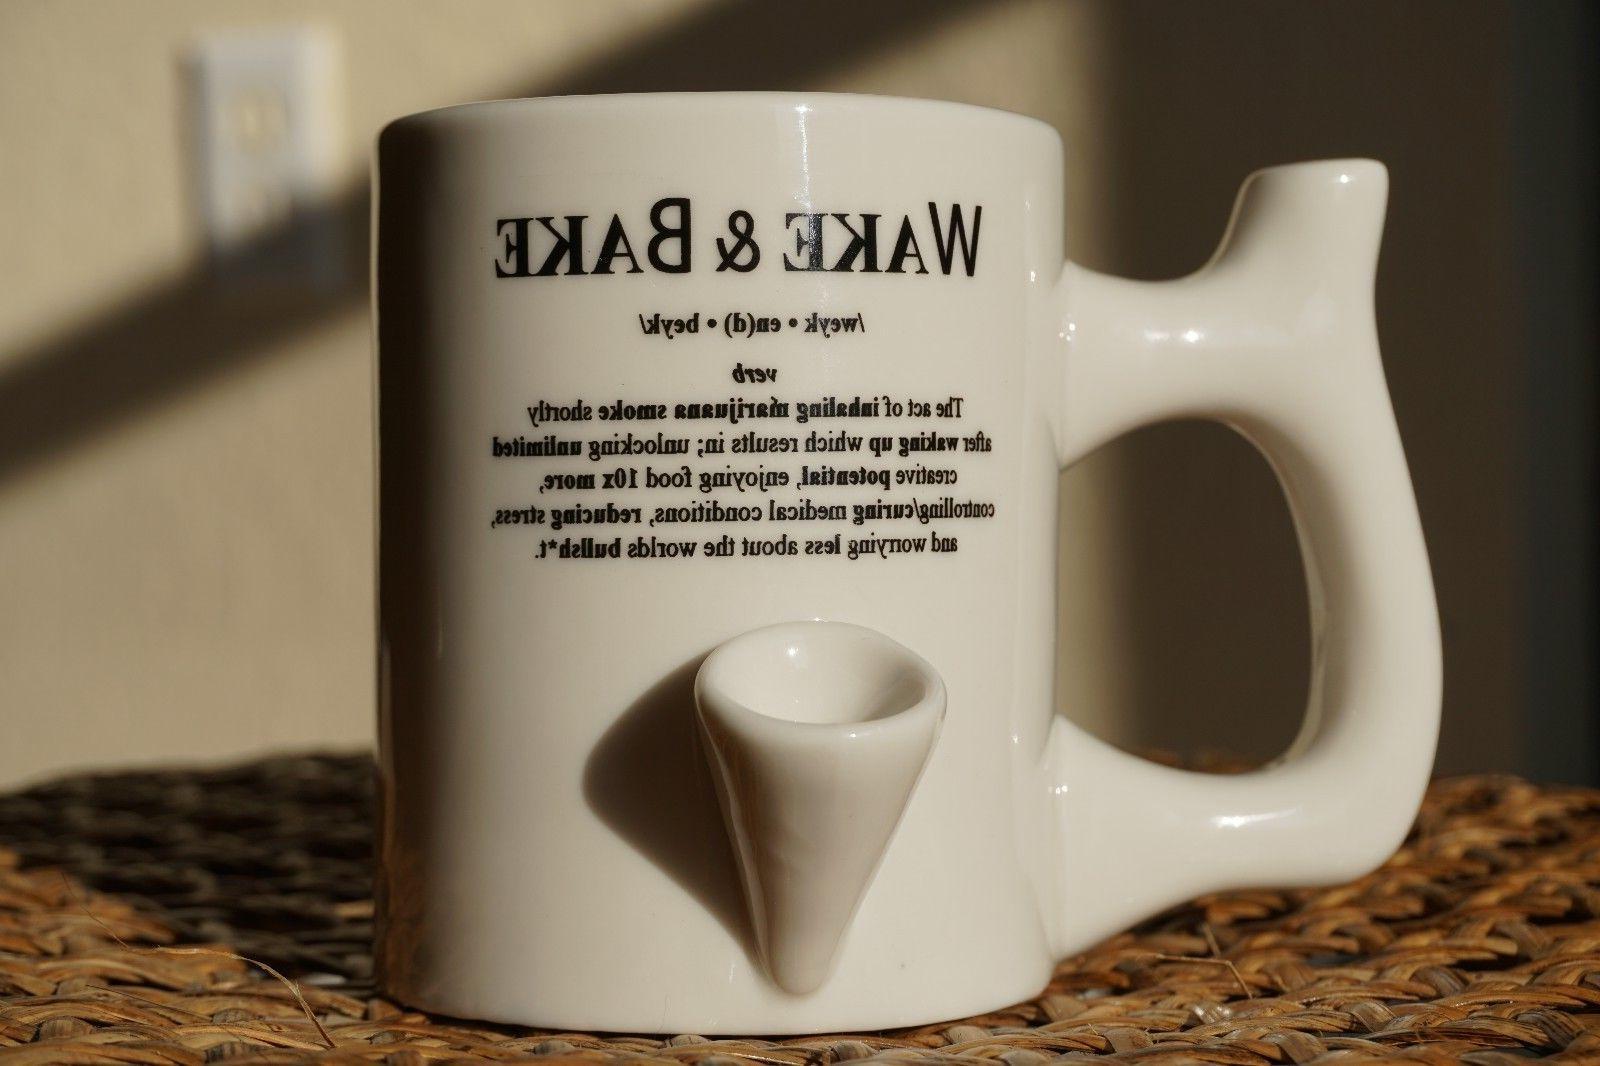 Wake and Bake Definition Coffee Mug Pipe Solid Ceramic